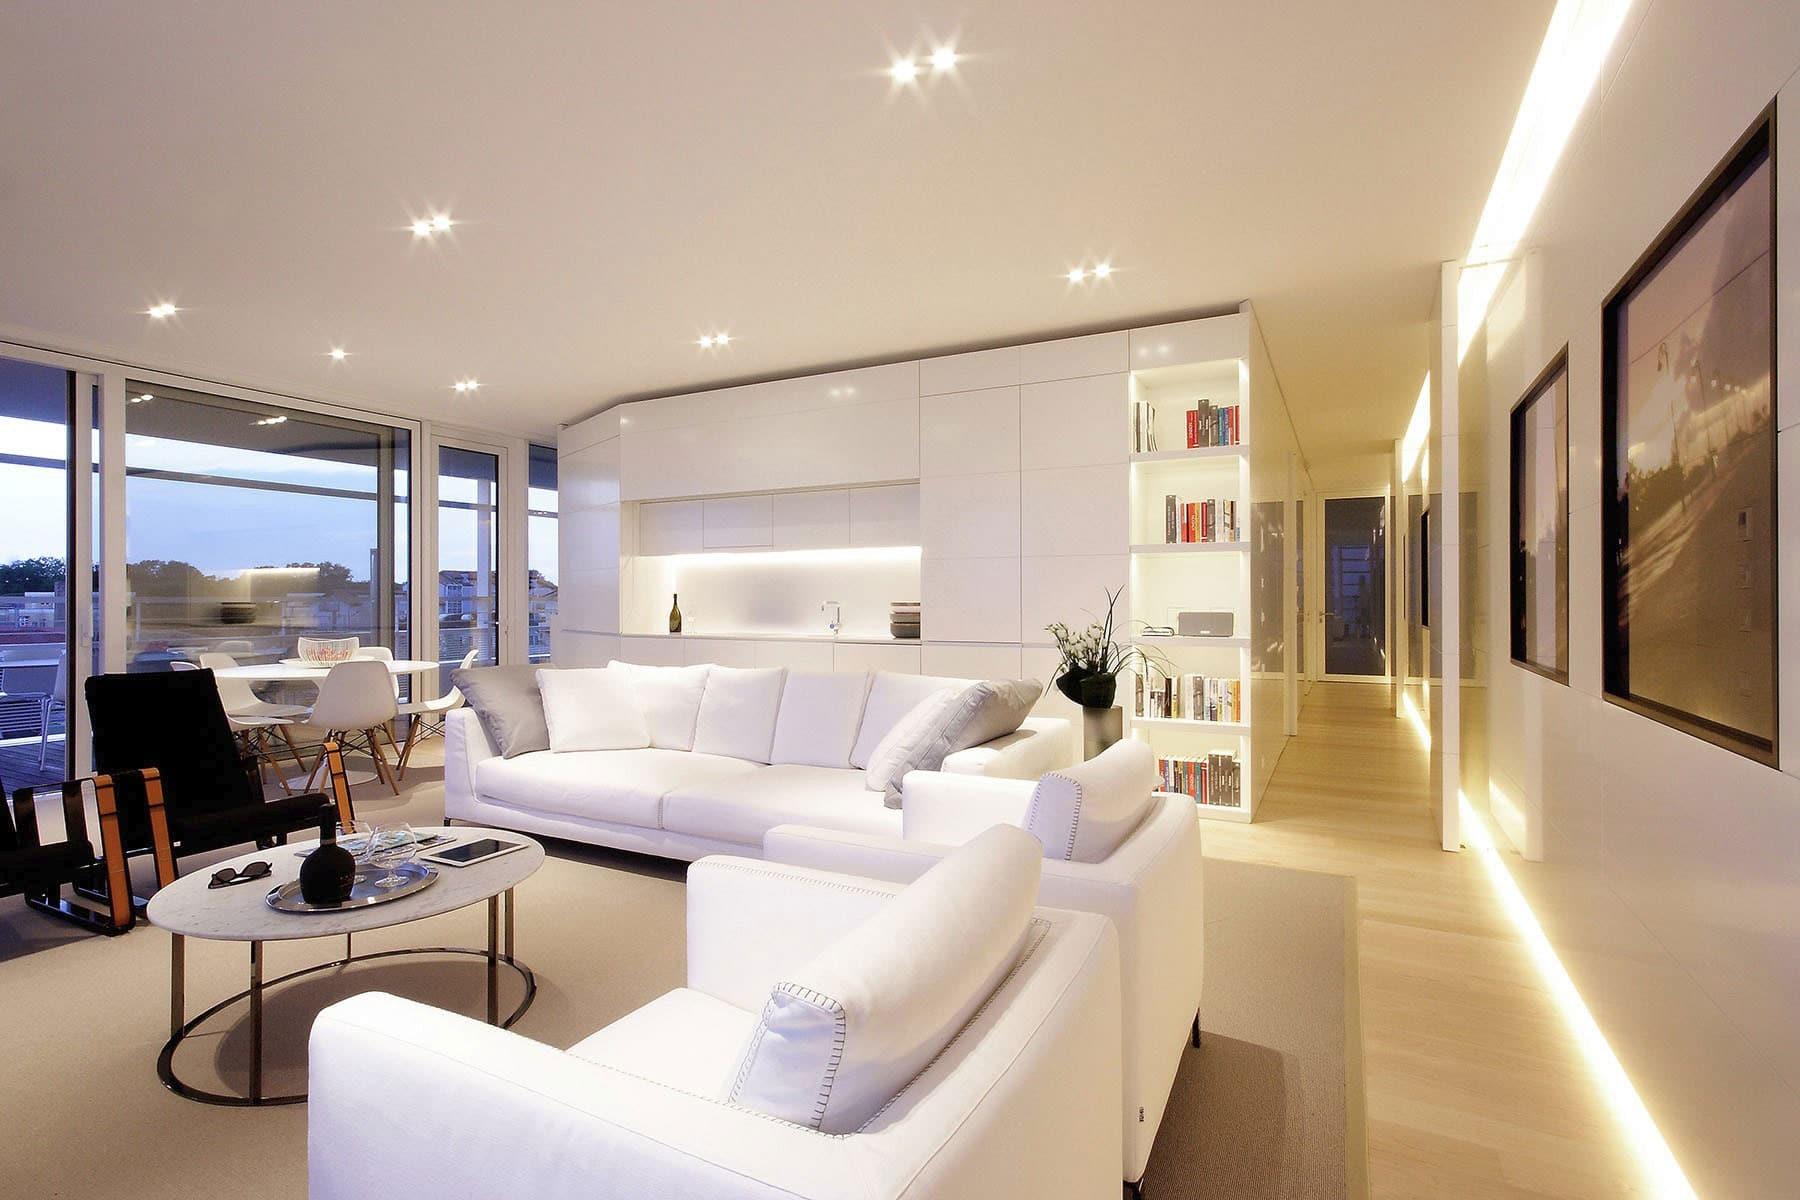 Plano departamento peque o dos dormitorios for Salas para departamentos pequenos